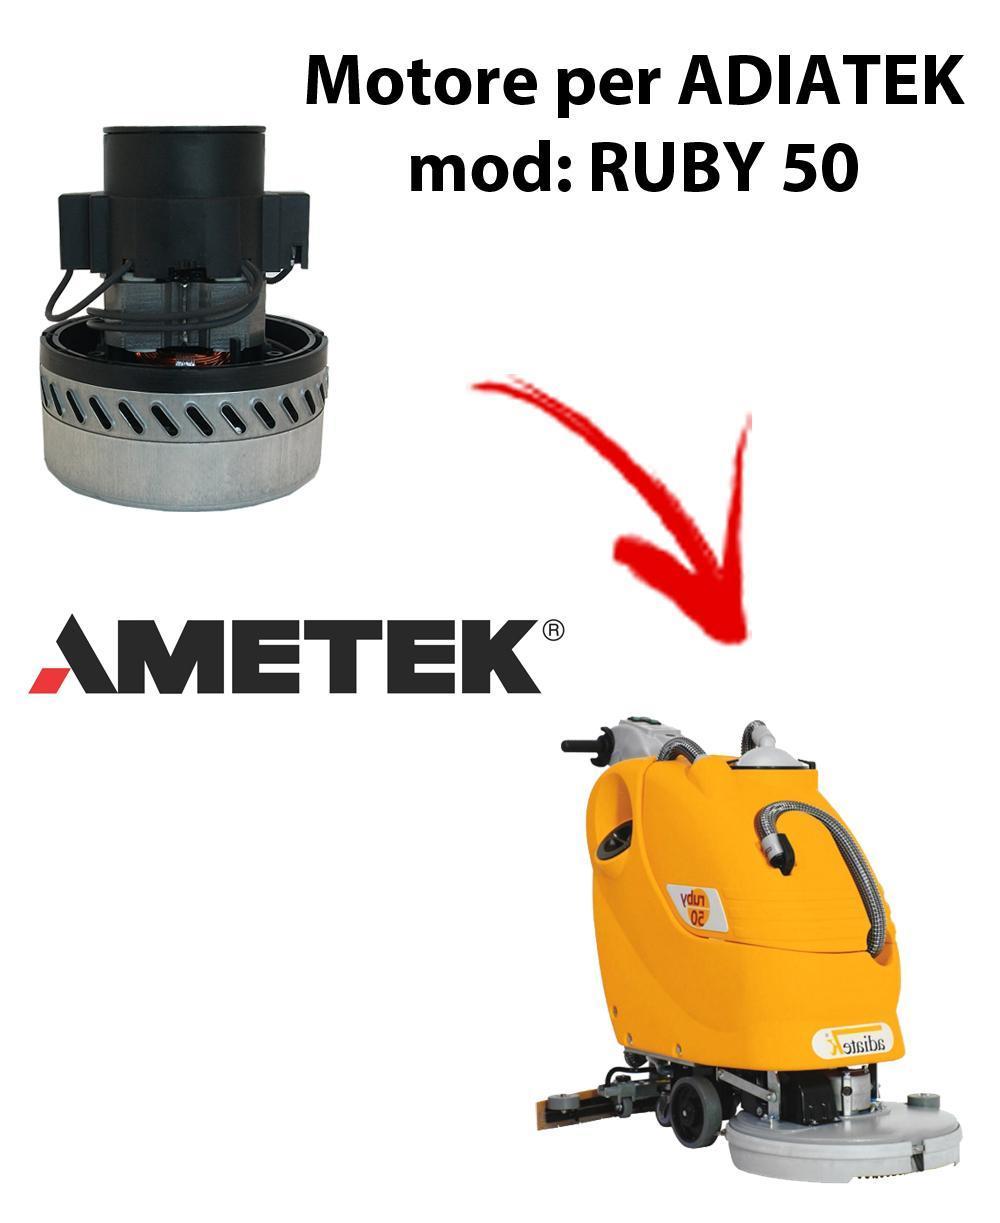 RUBY 50 Saugmotor AMETEK ITALIA für scheuersaugmaschinen Adiatek